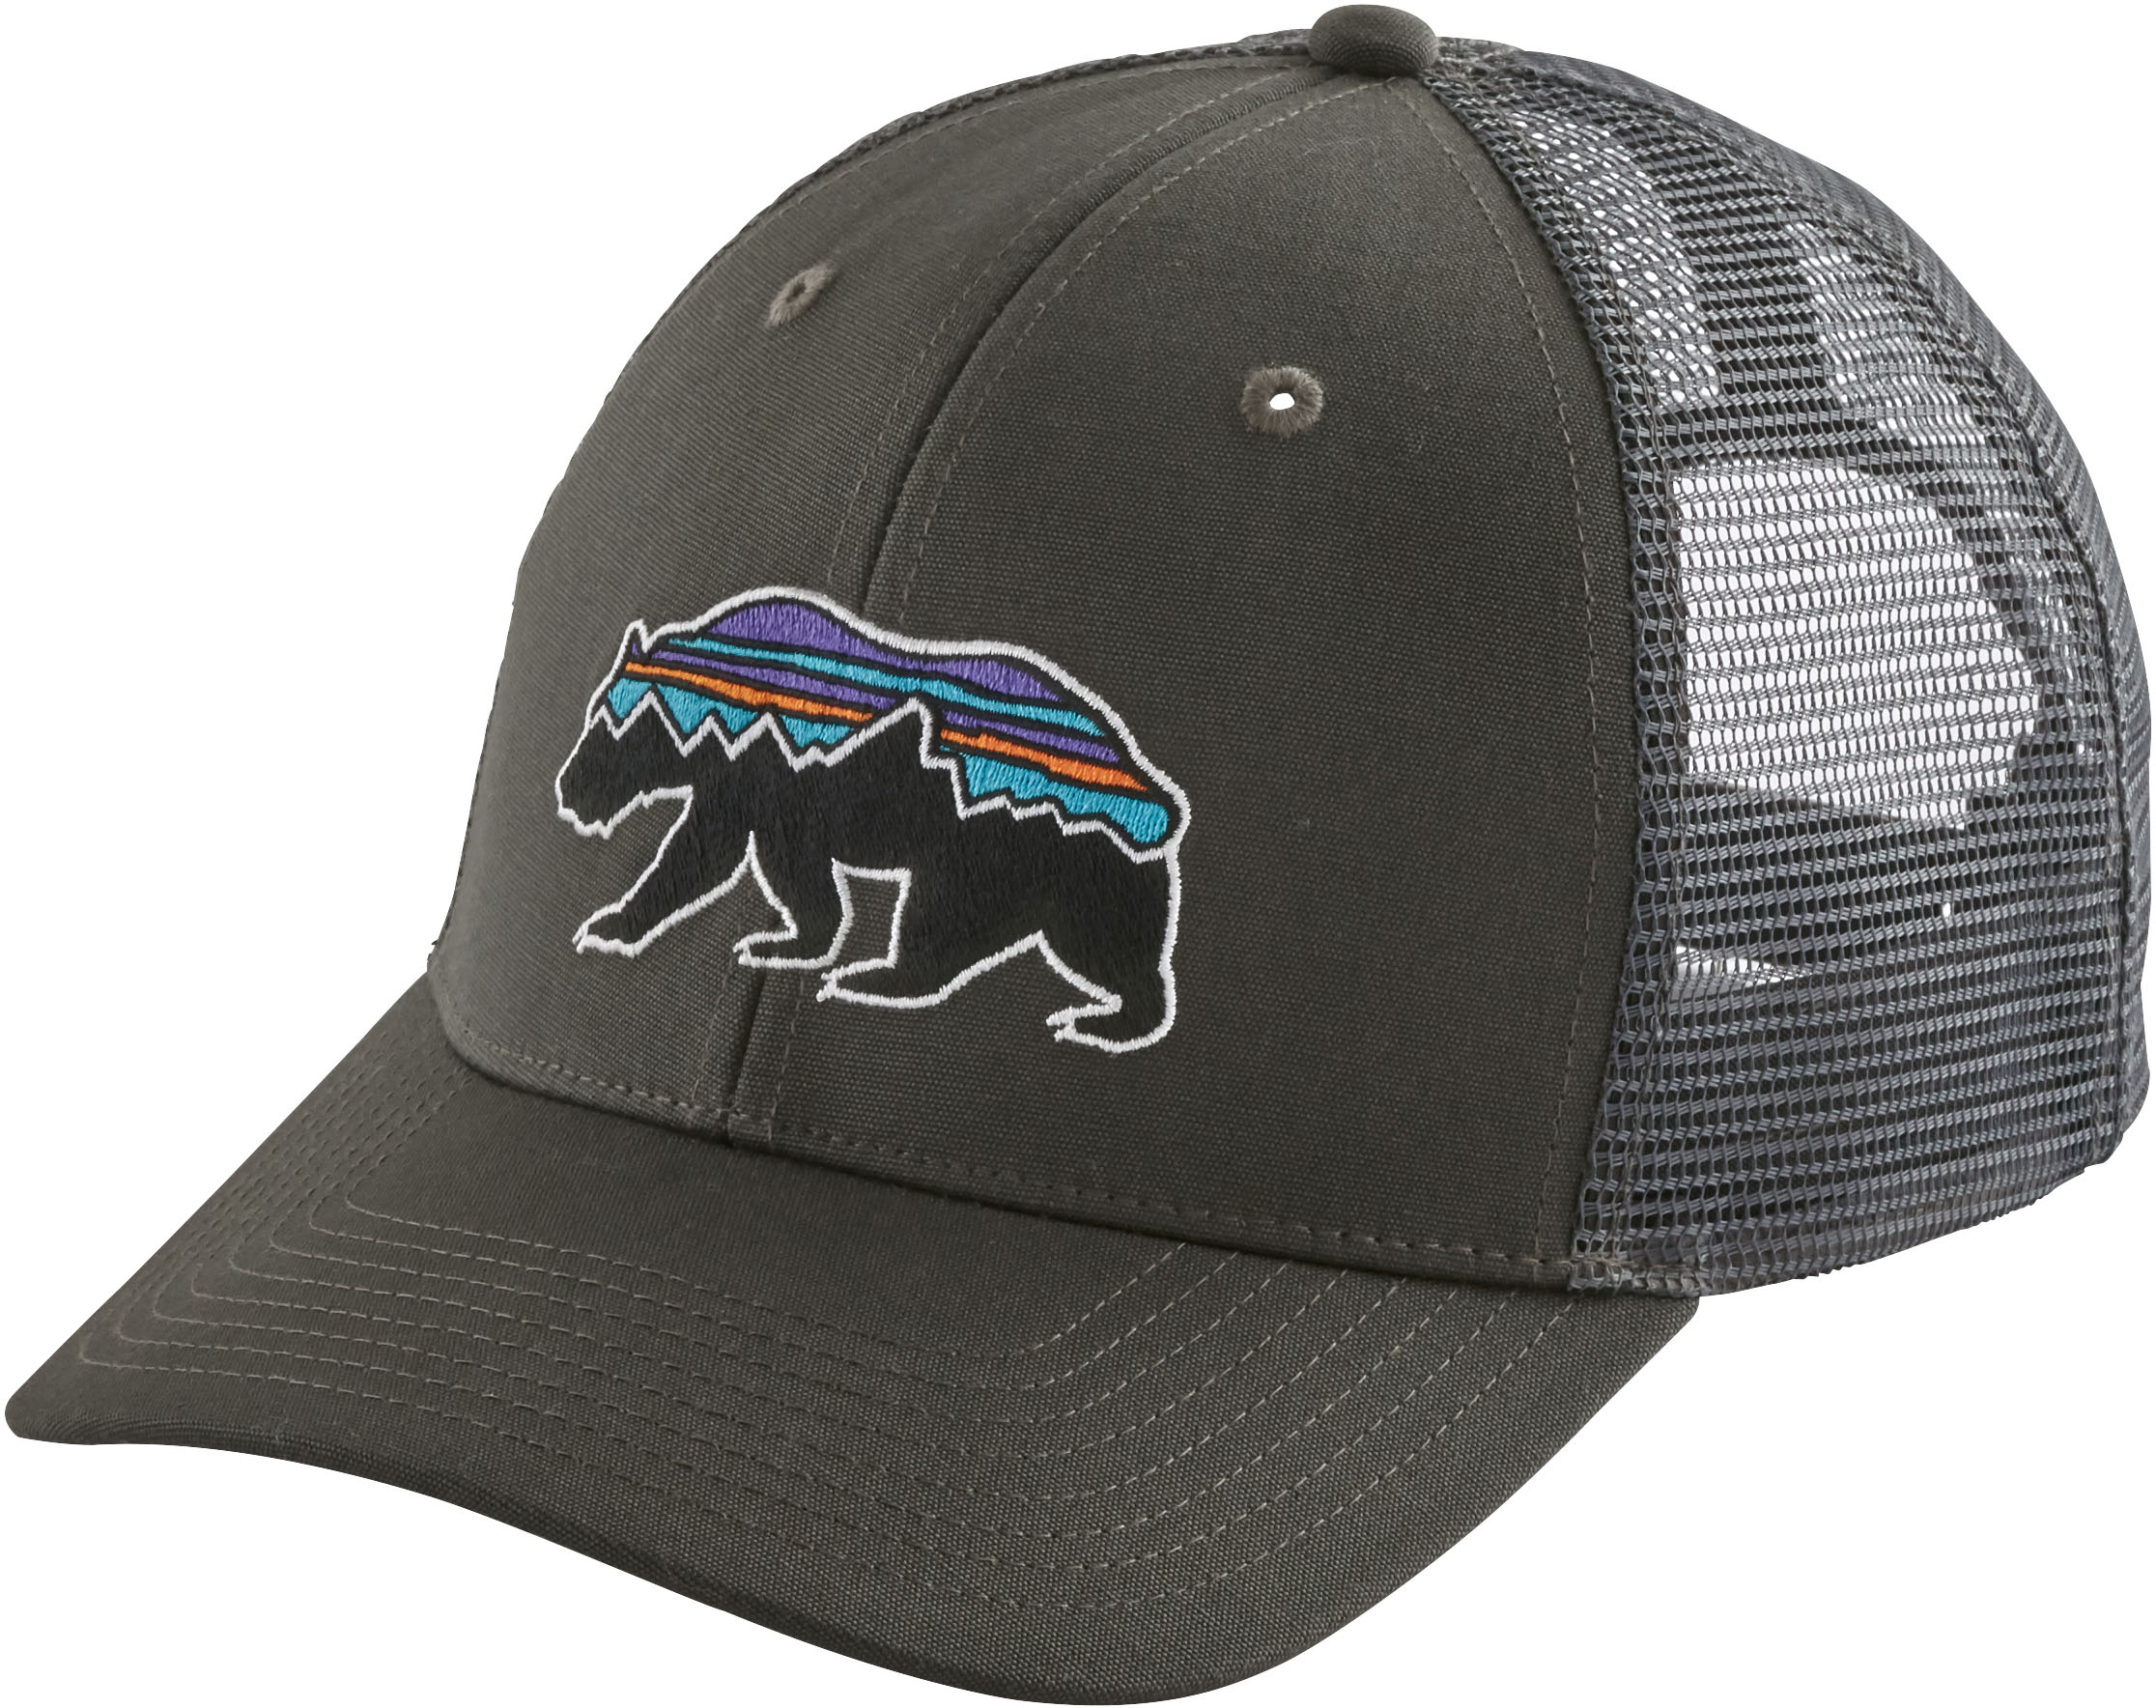 9adf12171 Patagonia Fitz Roy Bear Trucker Hat - Men's